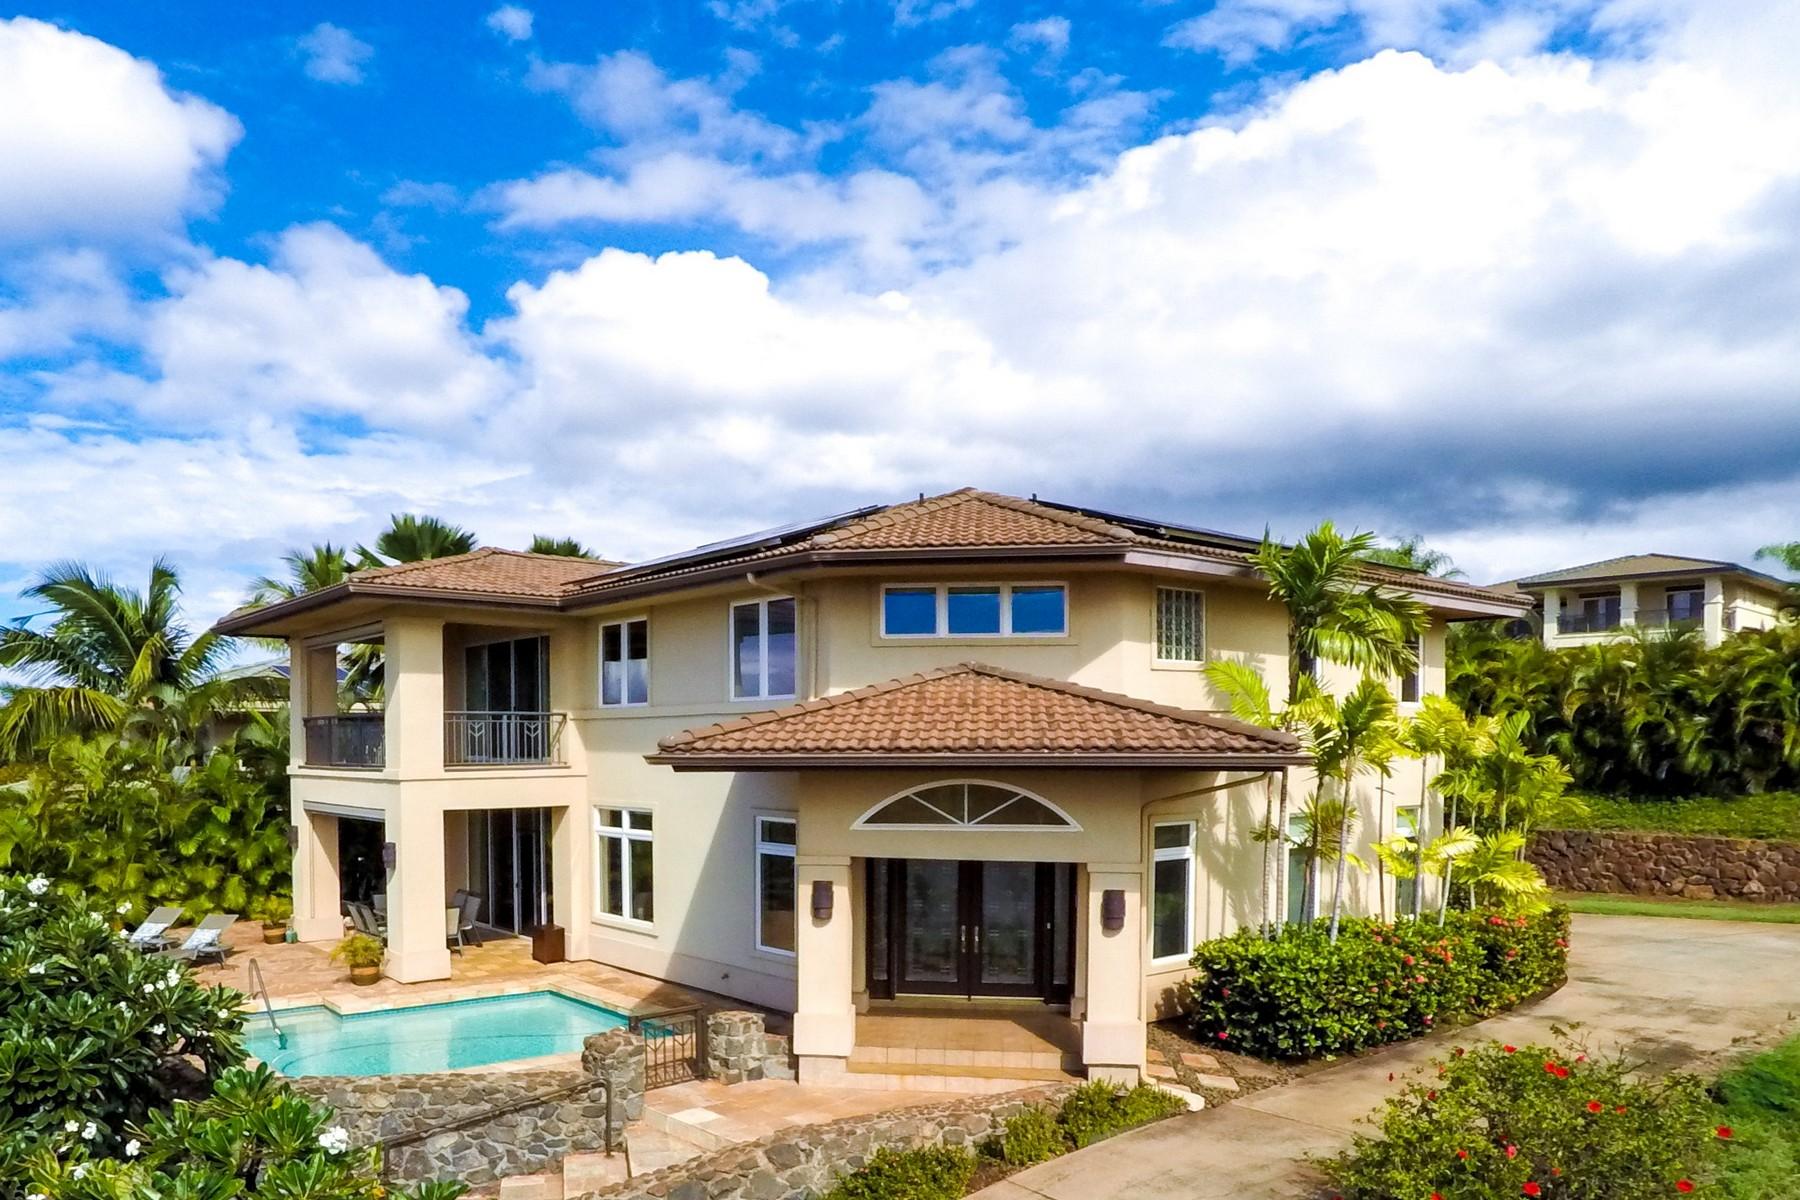 Single Family Home for Sale at Kaanapali Grandeur 365 Kului Way Kaanapali, Hawaii, 96761 United States